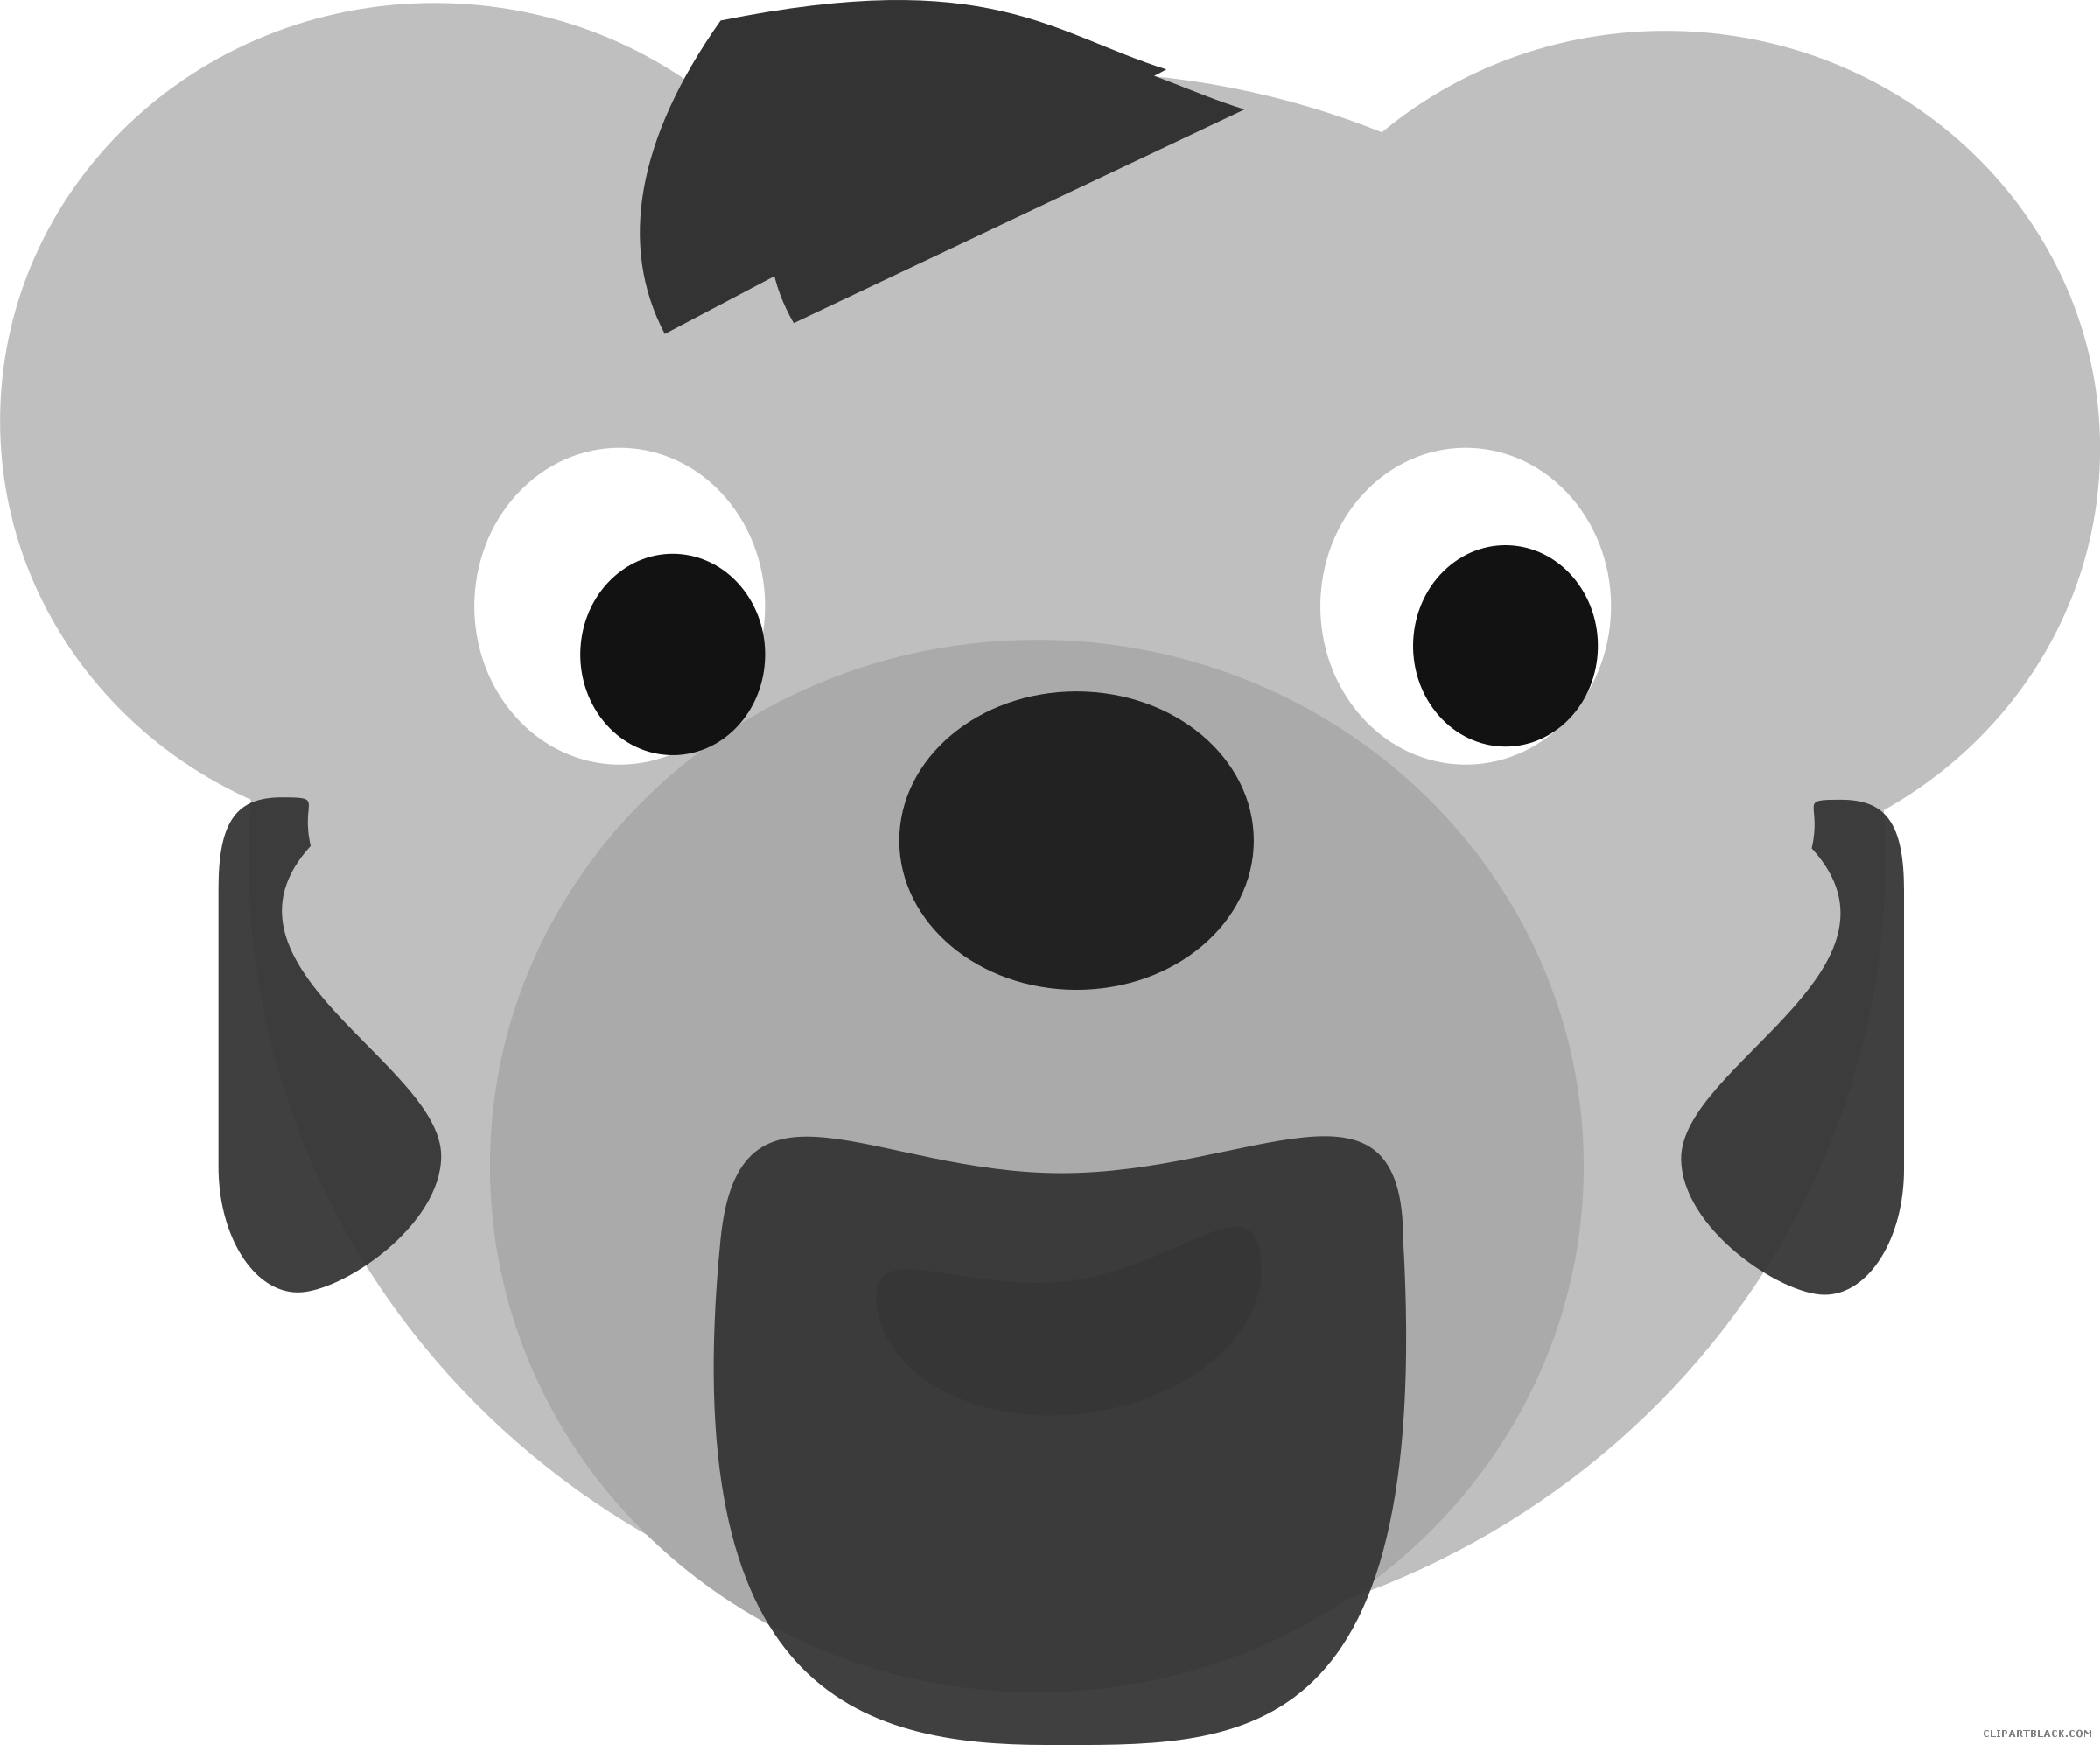 Bear head animal free. Elk football player clipart